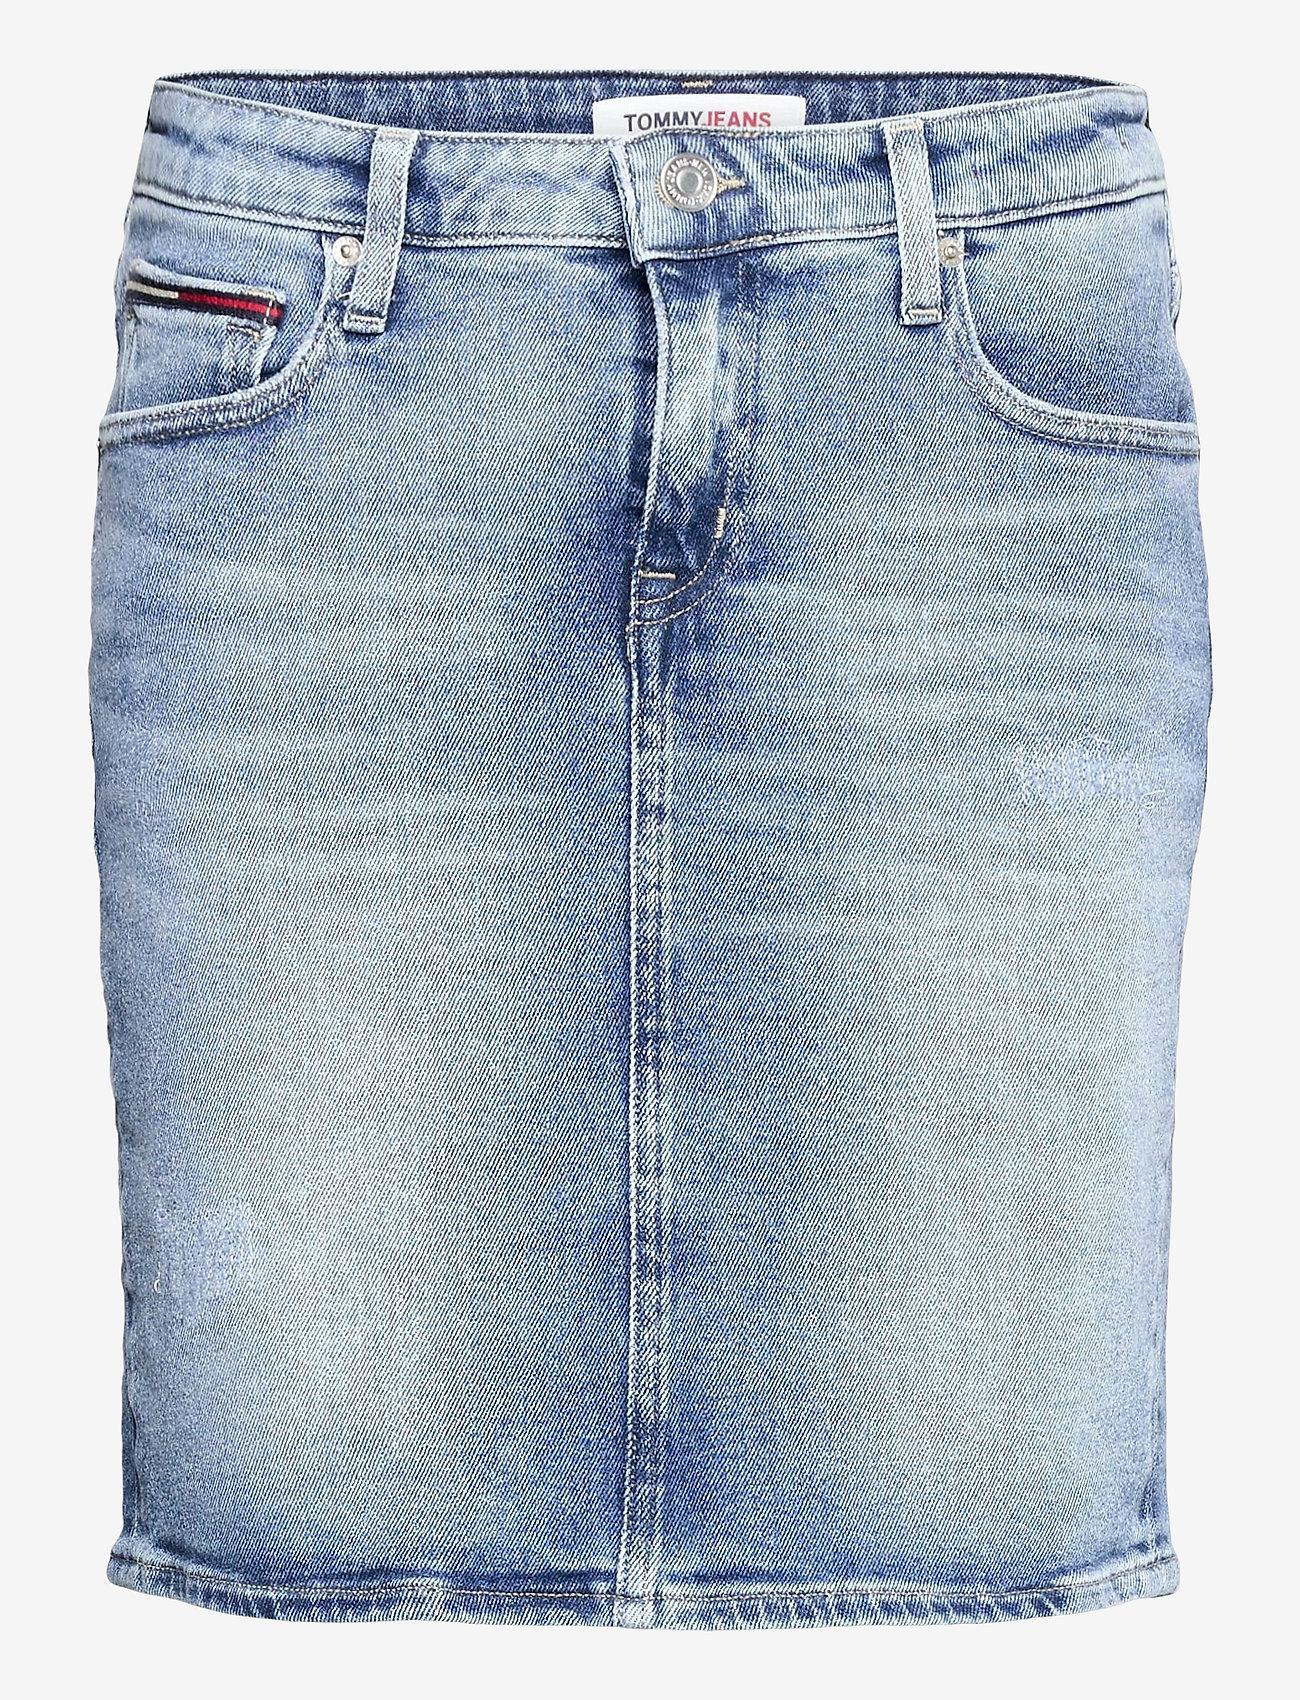 Tommy Jeans - CLASSIC DENIM SKIRT ALBS - jeanskjolar - arina lb str - 0